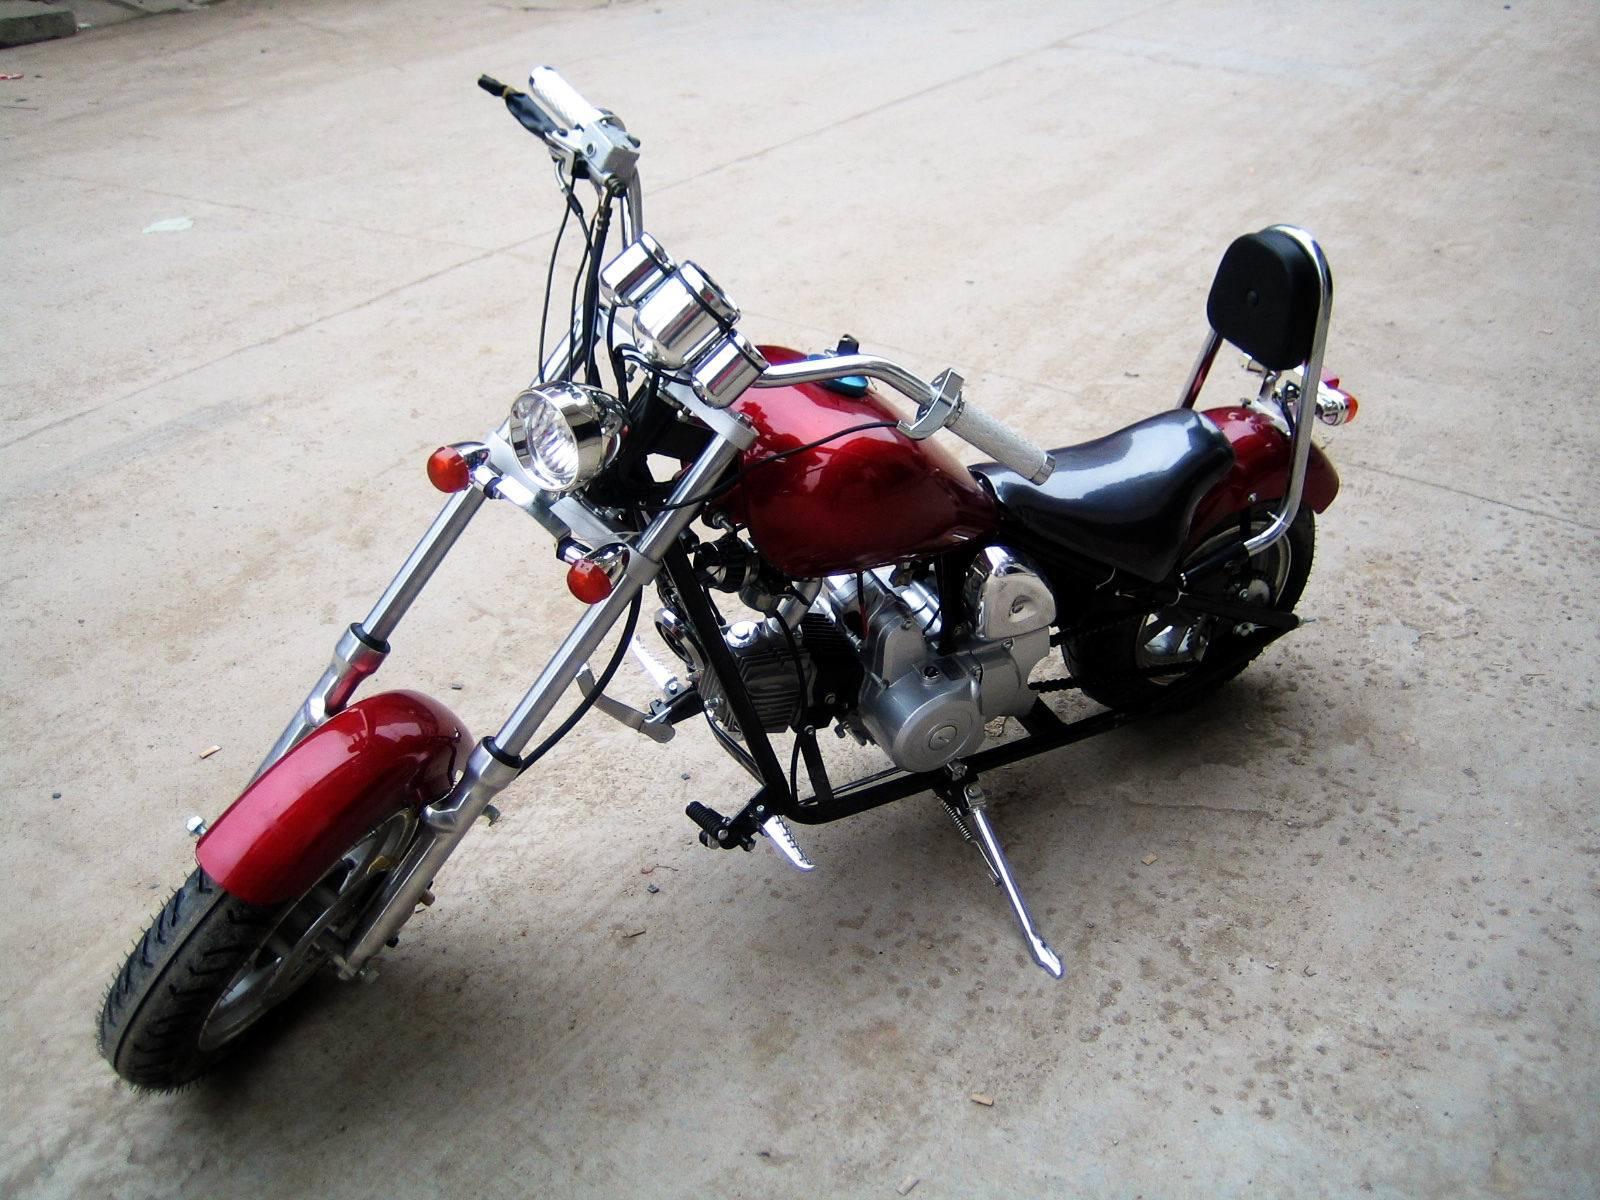 50cc mini chopper wiring diagram 1998 saturn sl2 stereo 49cc 2 stroke free engine